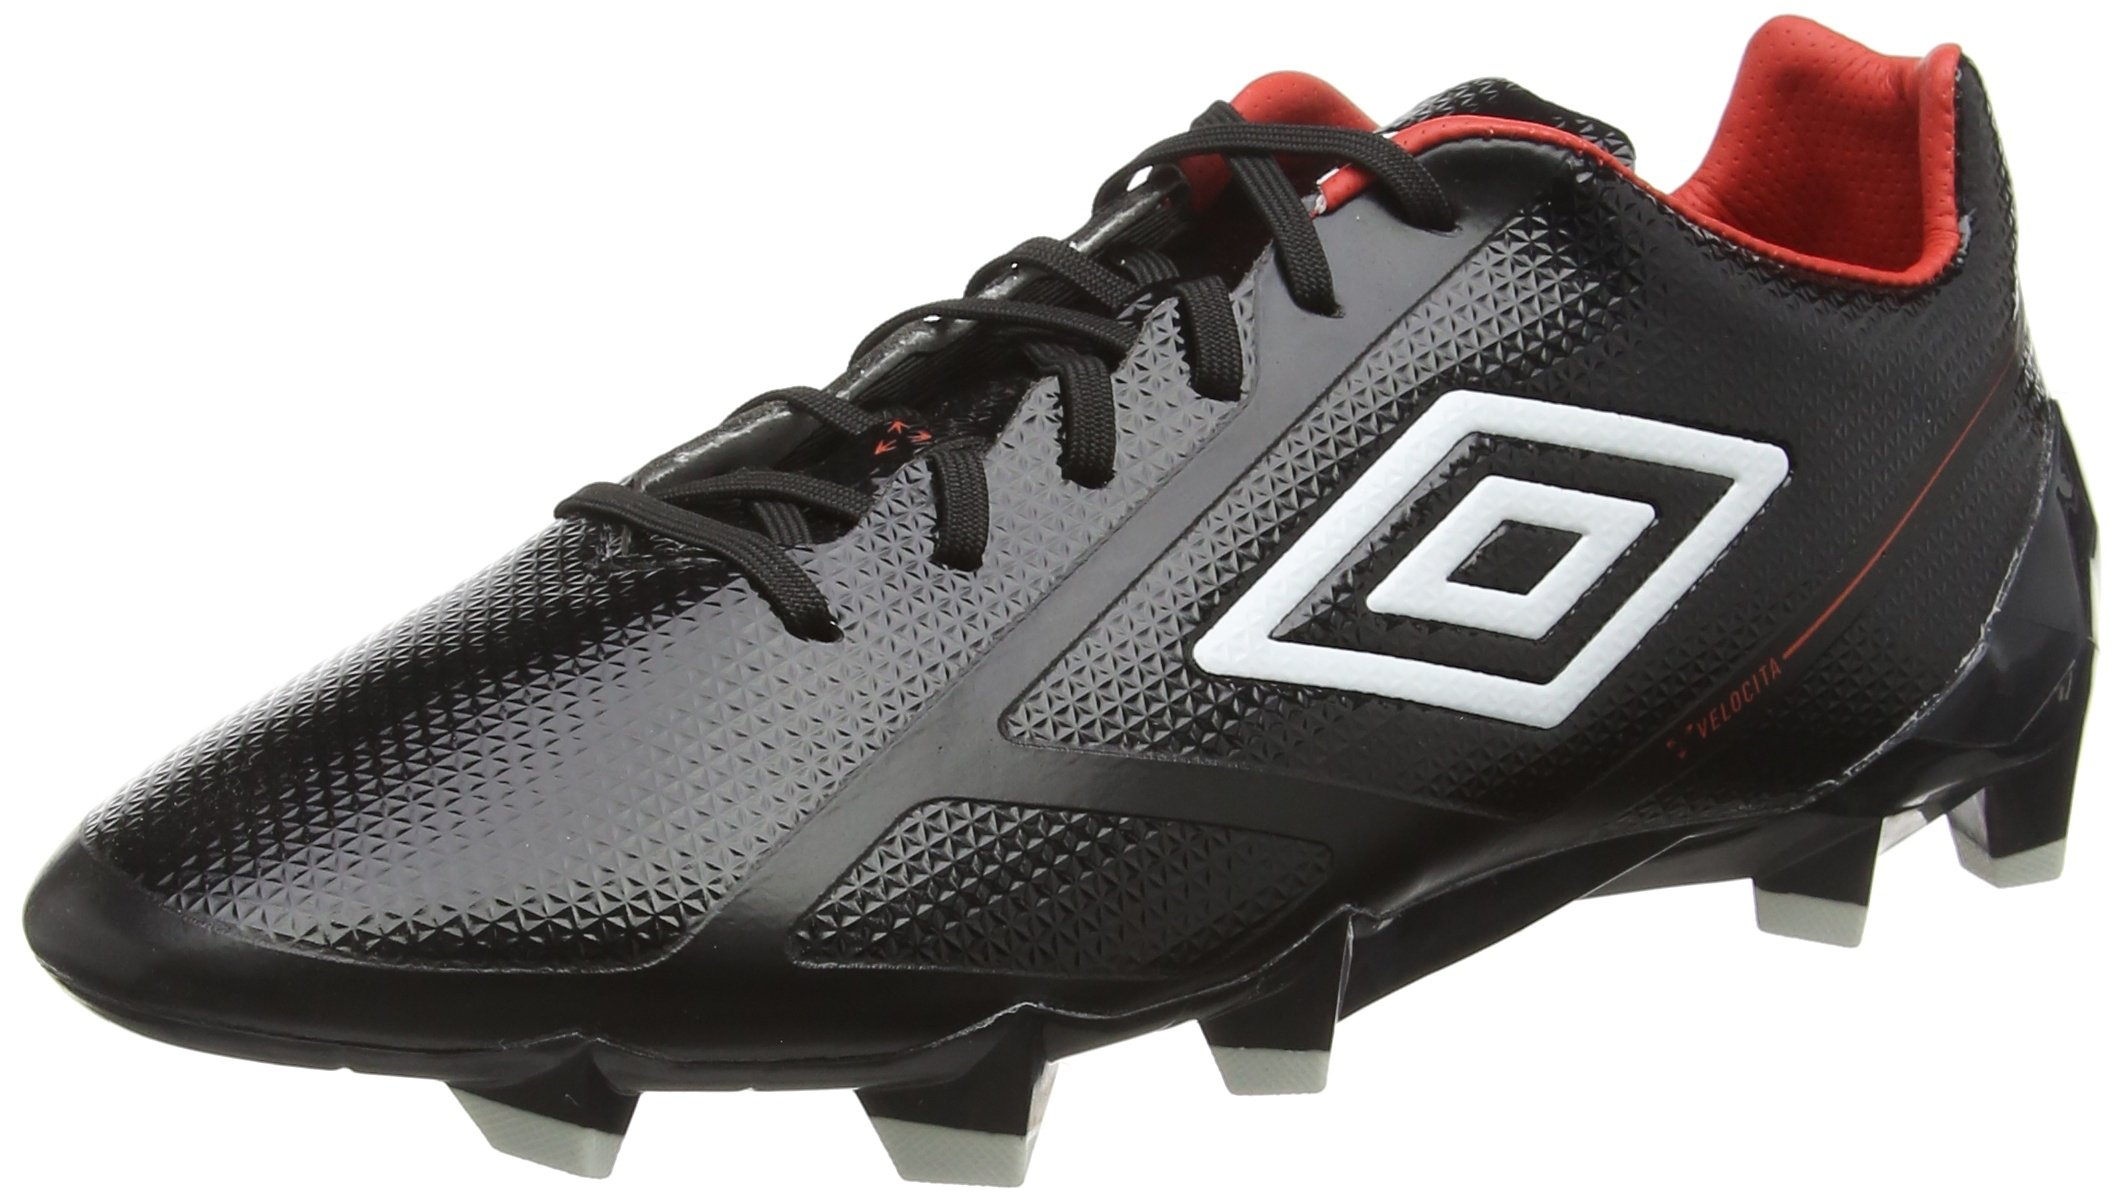 Eu Umbro HommeNoirecl 5 2 Velocita Pro De grenadine47 black white HgChaussures Football NnmwOPv80y